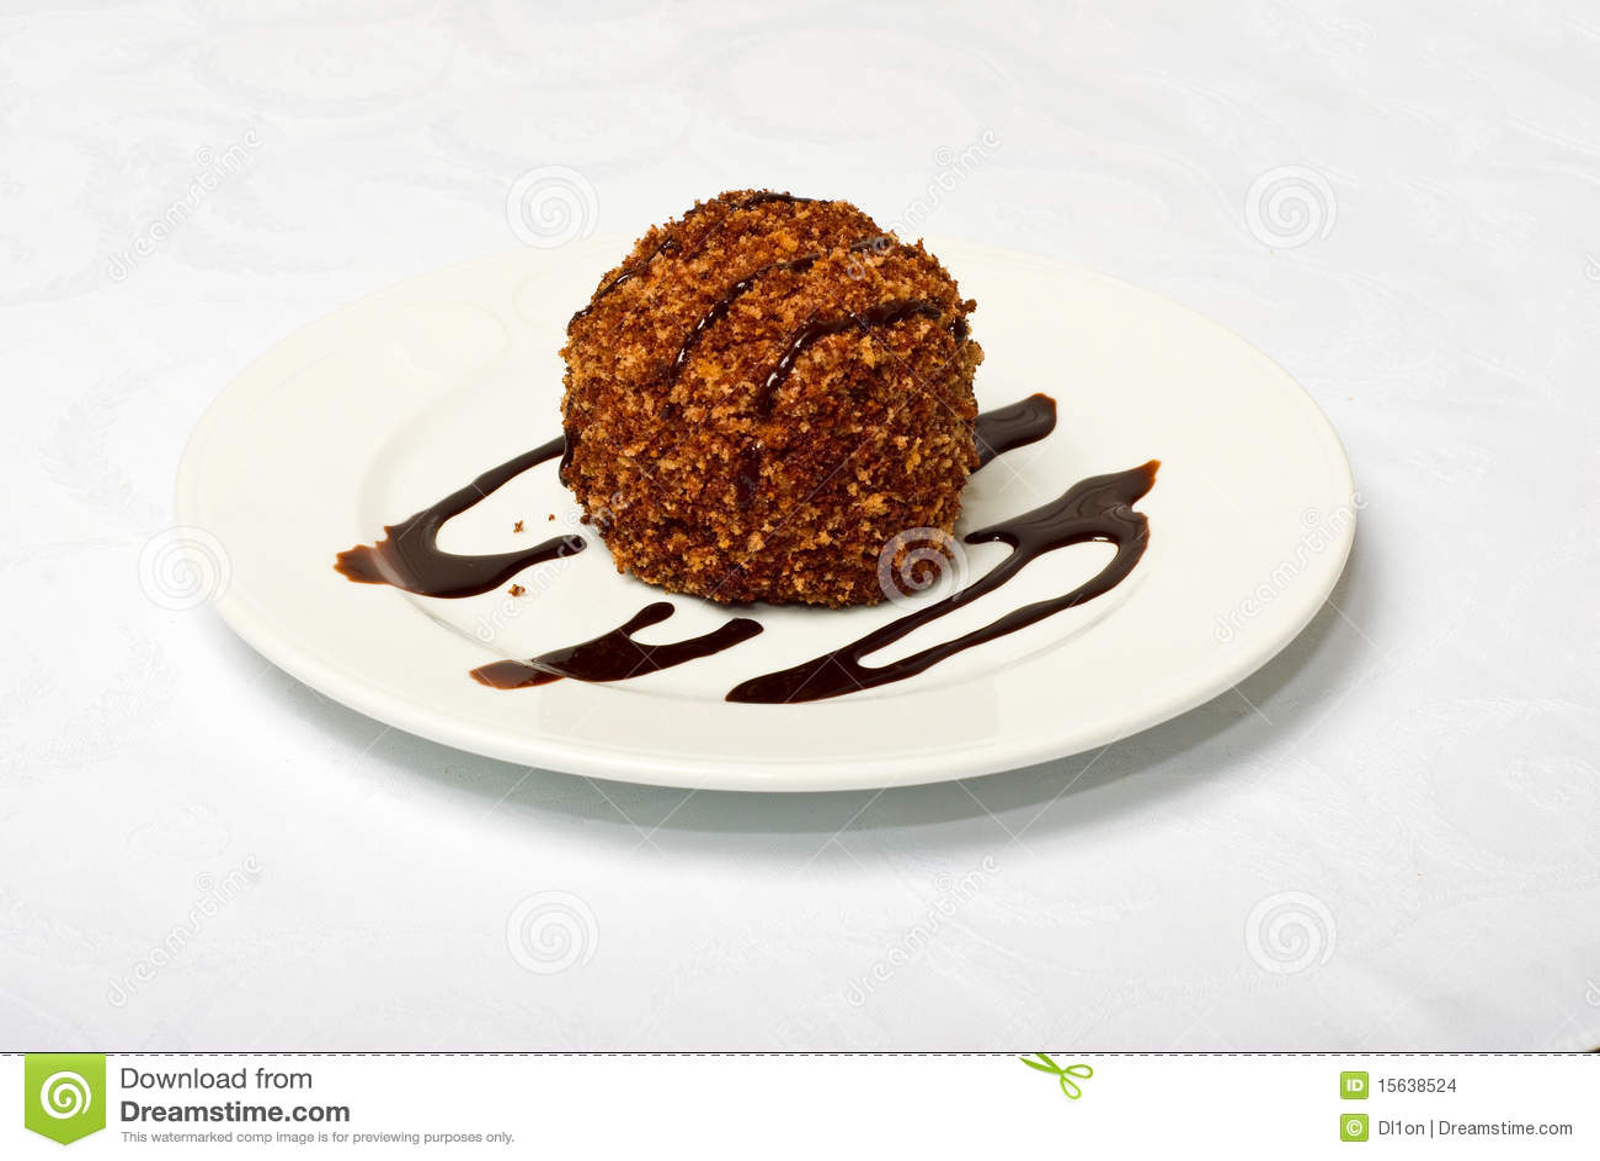 Tasty Chocolate Cake Images : Tasty Chocolate Cake On White Plate Stock Images - Image ...